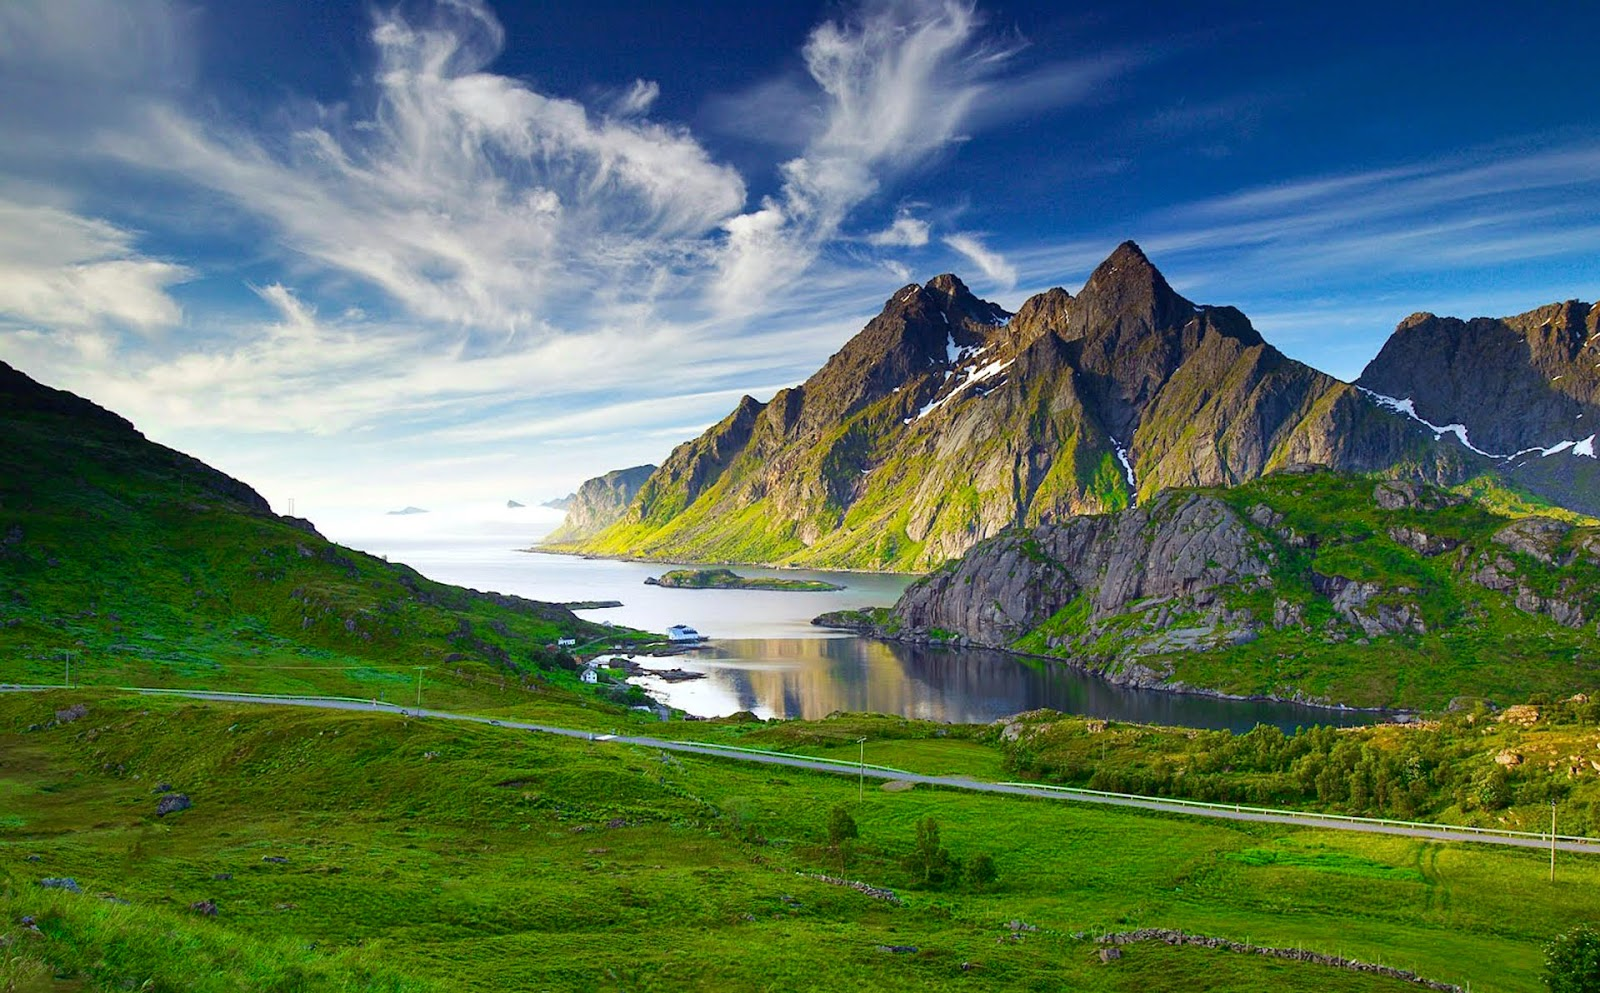 imagenes de paisajes hermosos (4)